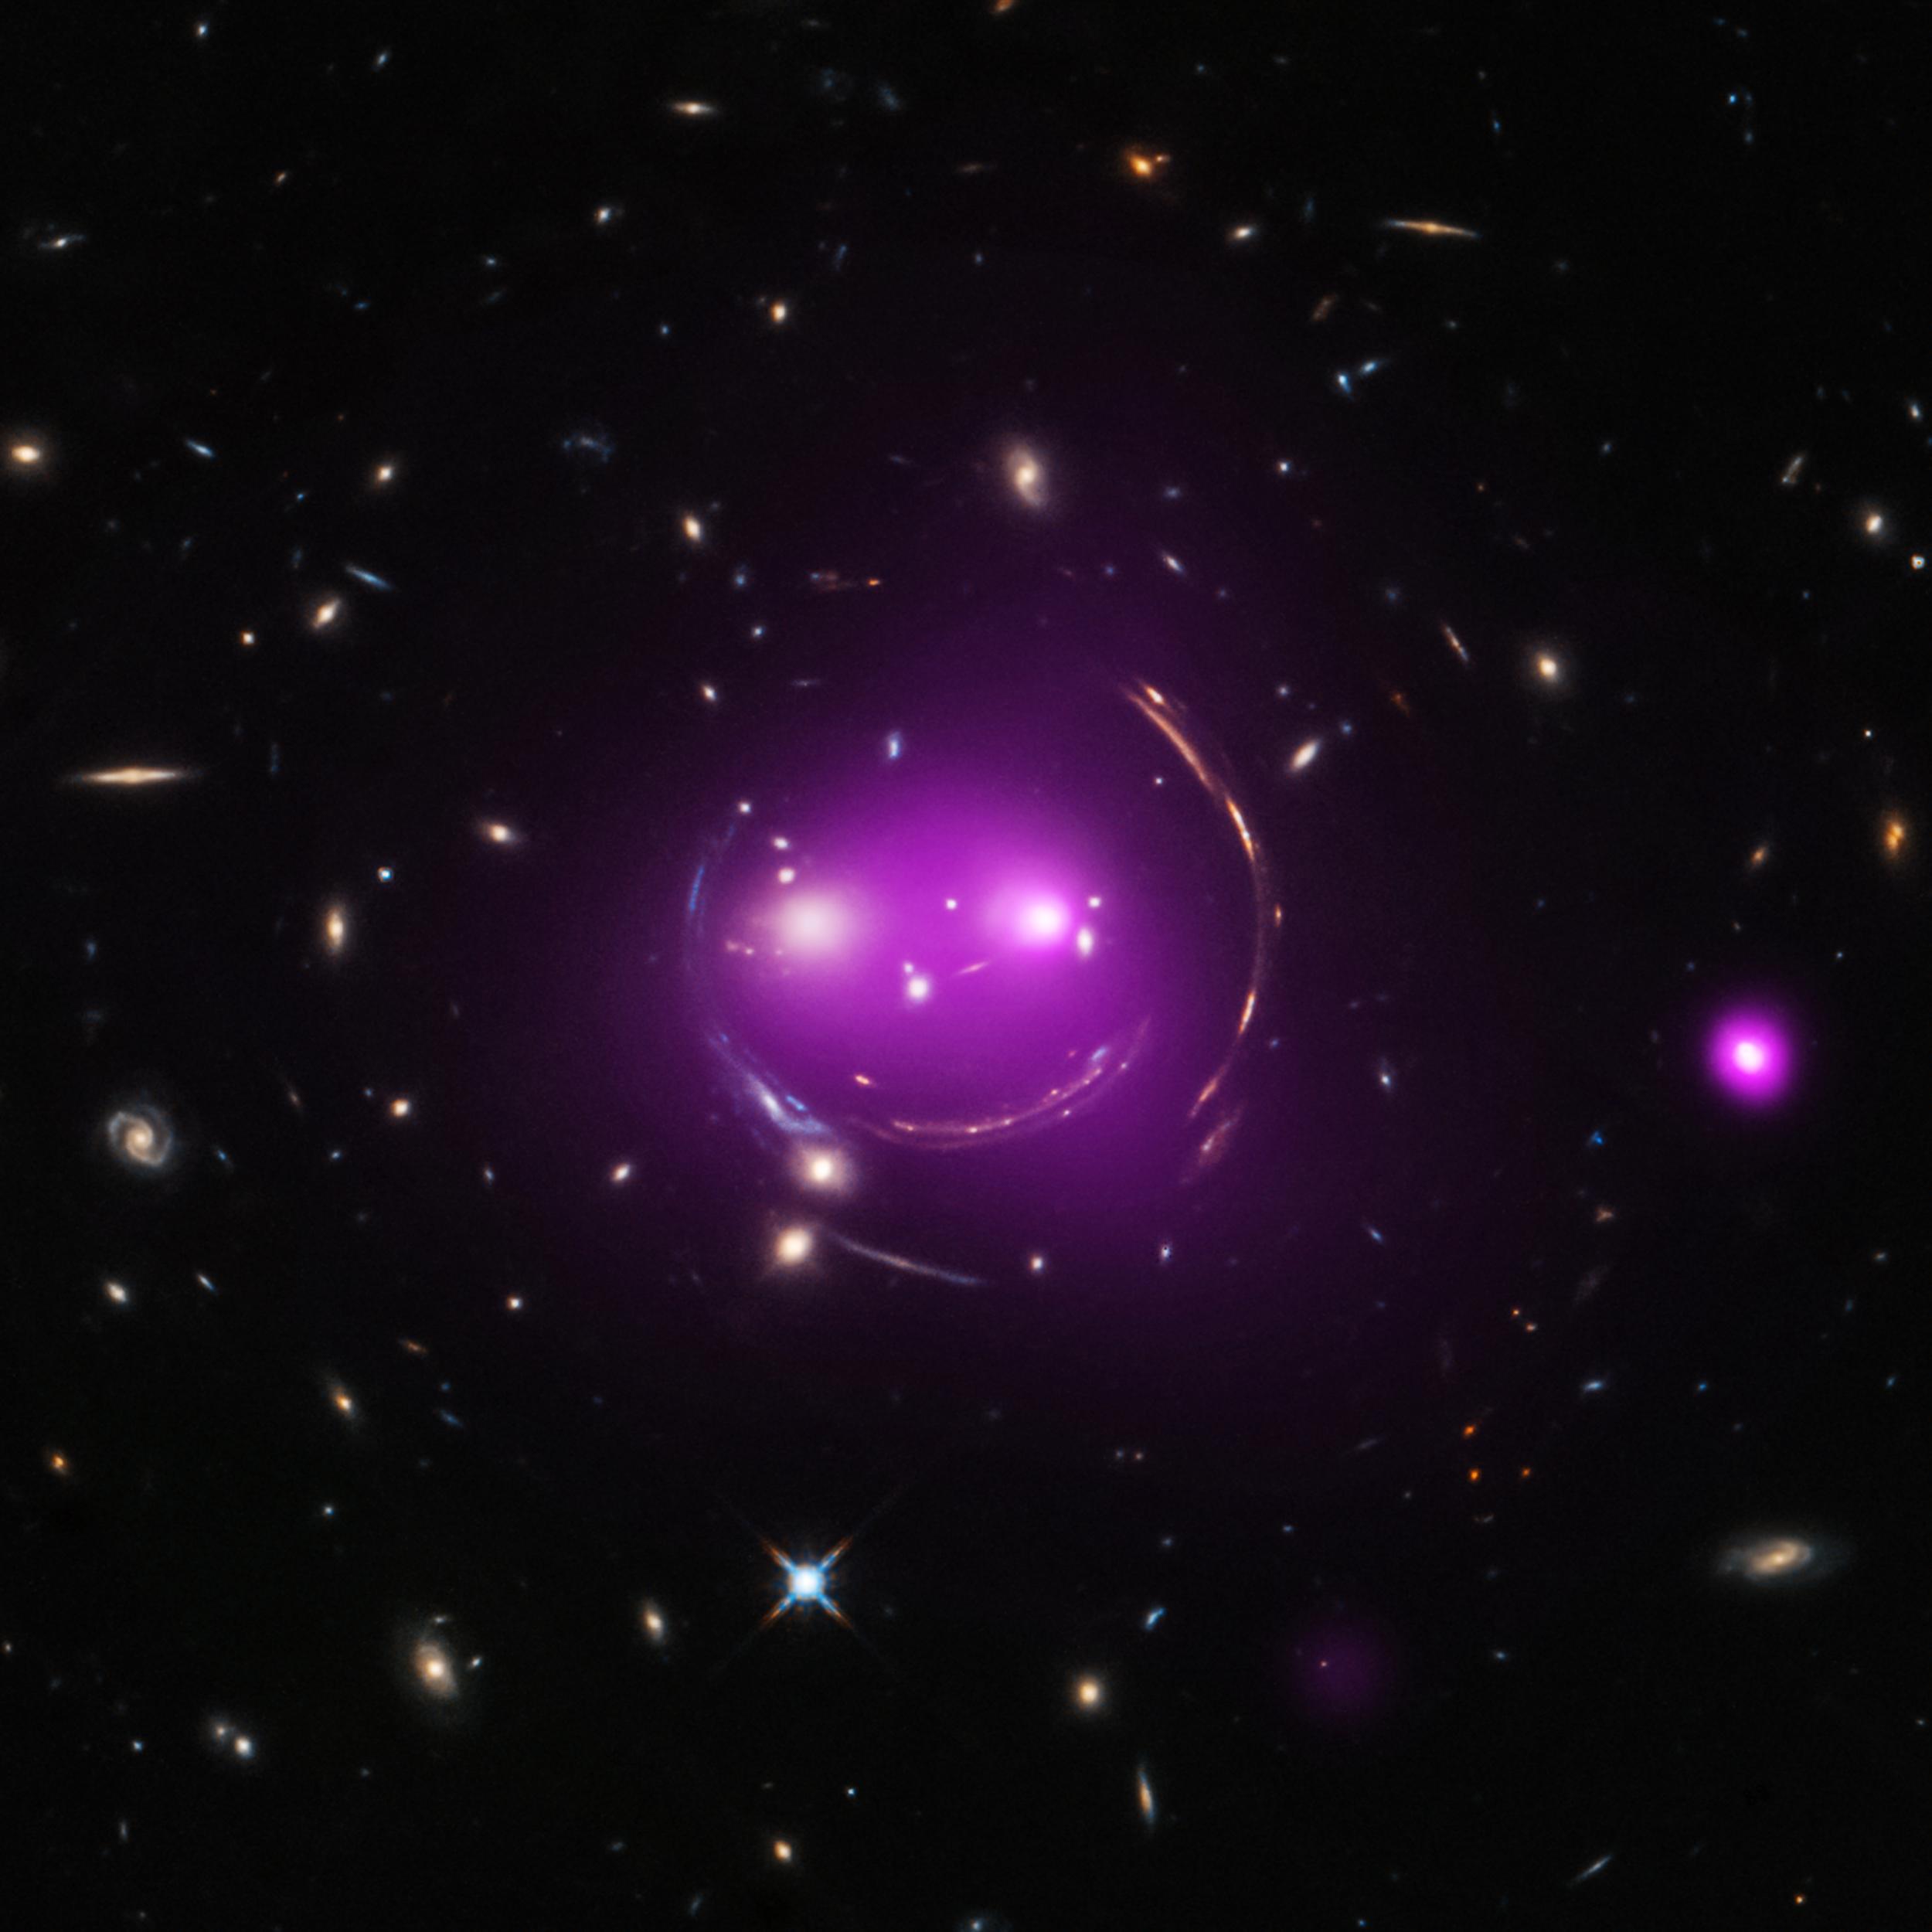 Image credit:  X-ray: NASA/CXC/UA/J.Irwin et al; Optical: NASA/STScI